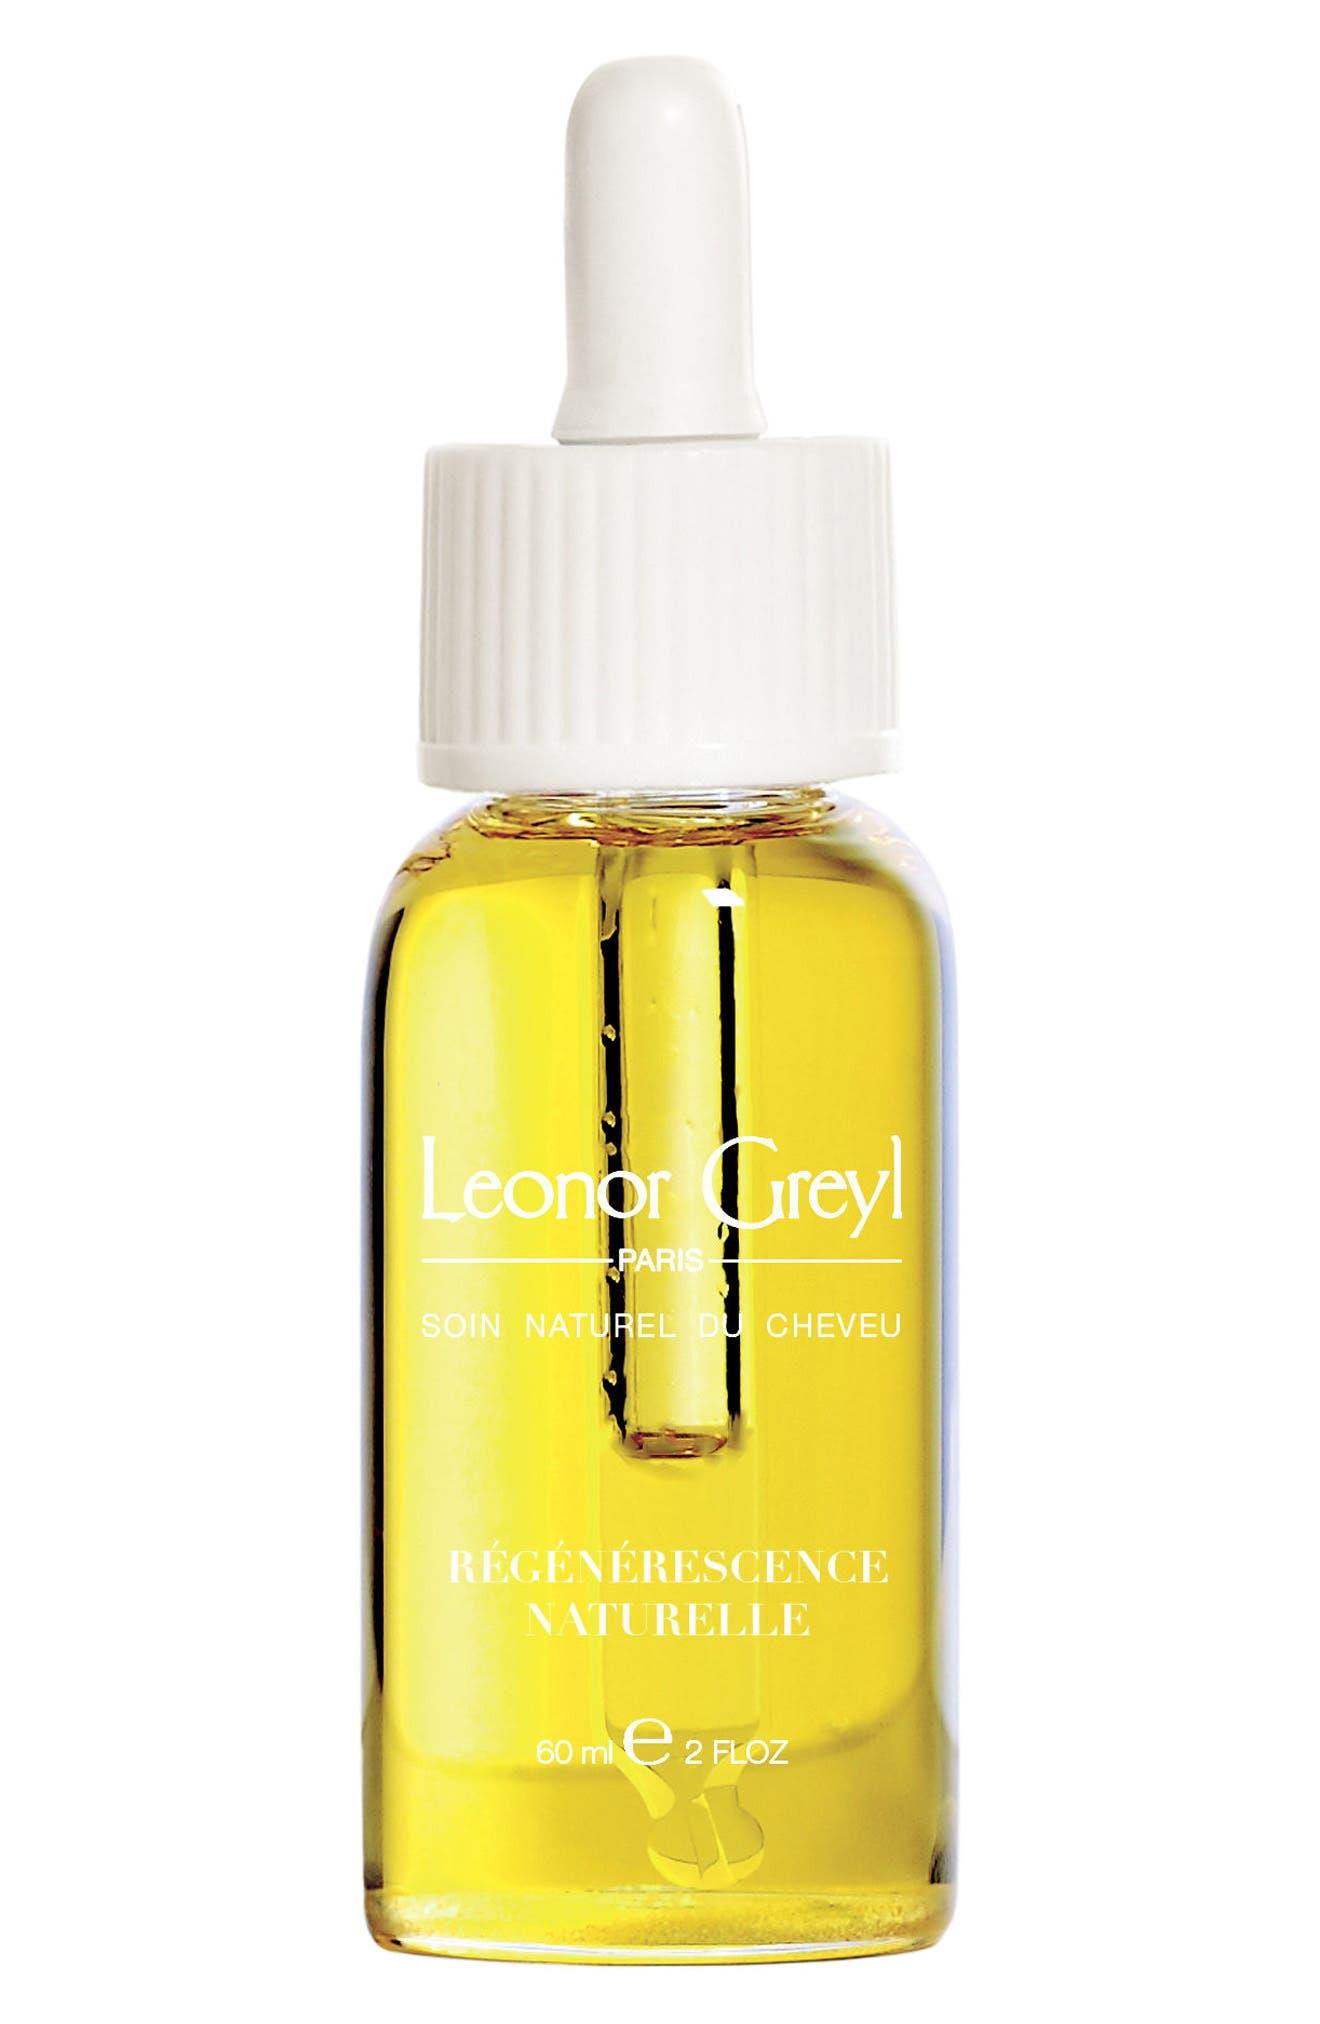 Leonor Greyl PARIS 'Régénérescence Naturelle' Pre-Shampoo Treatment